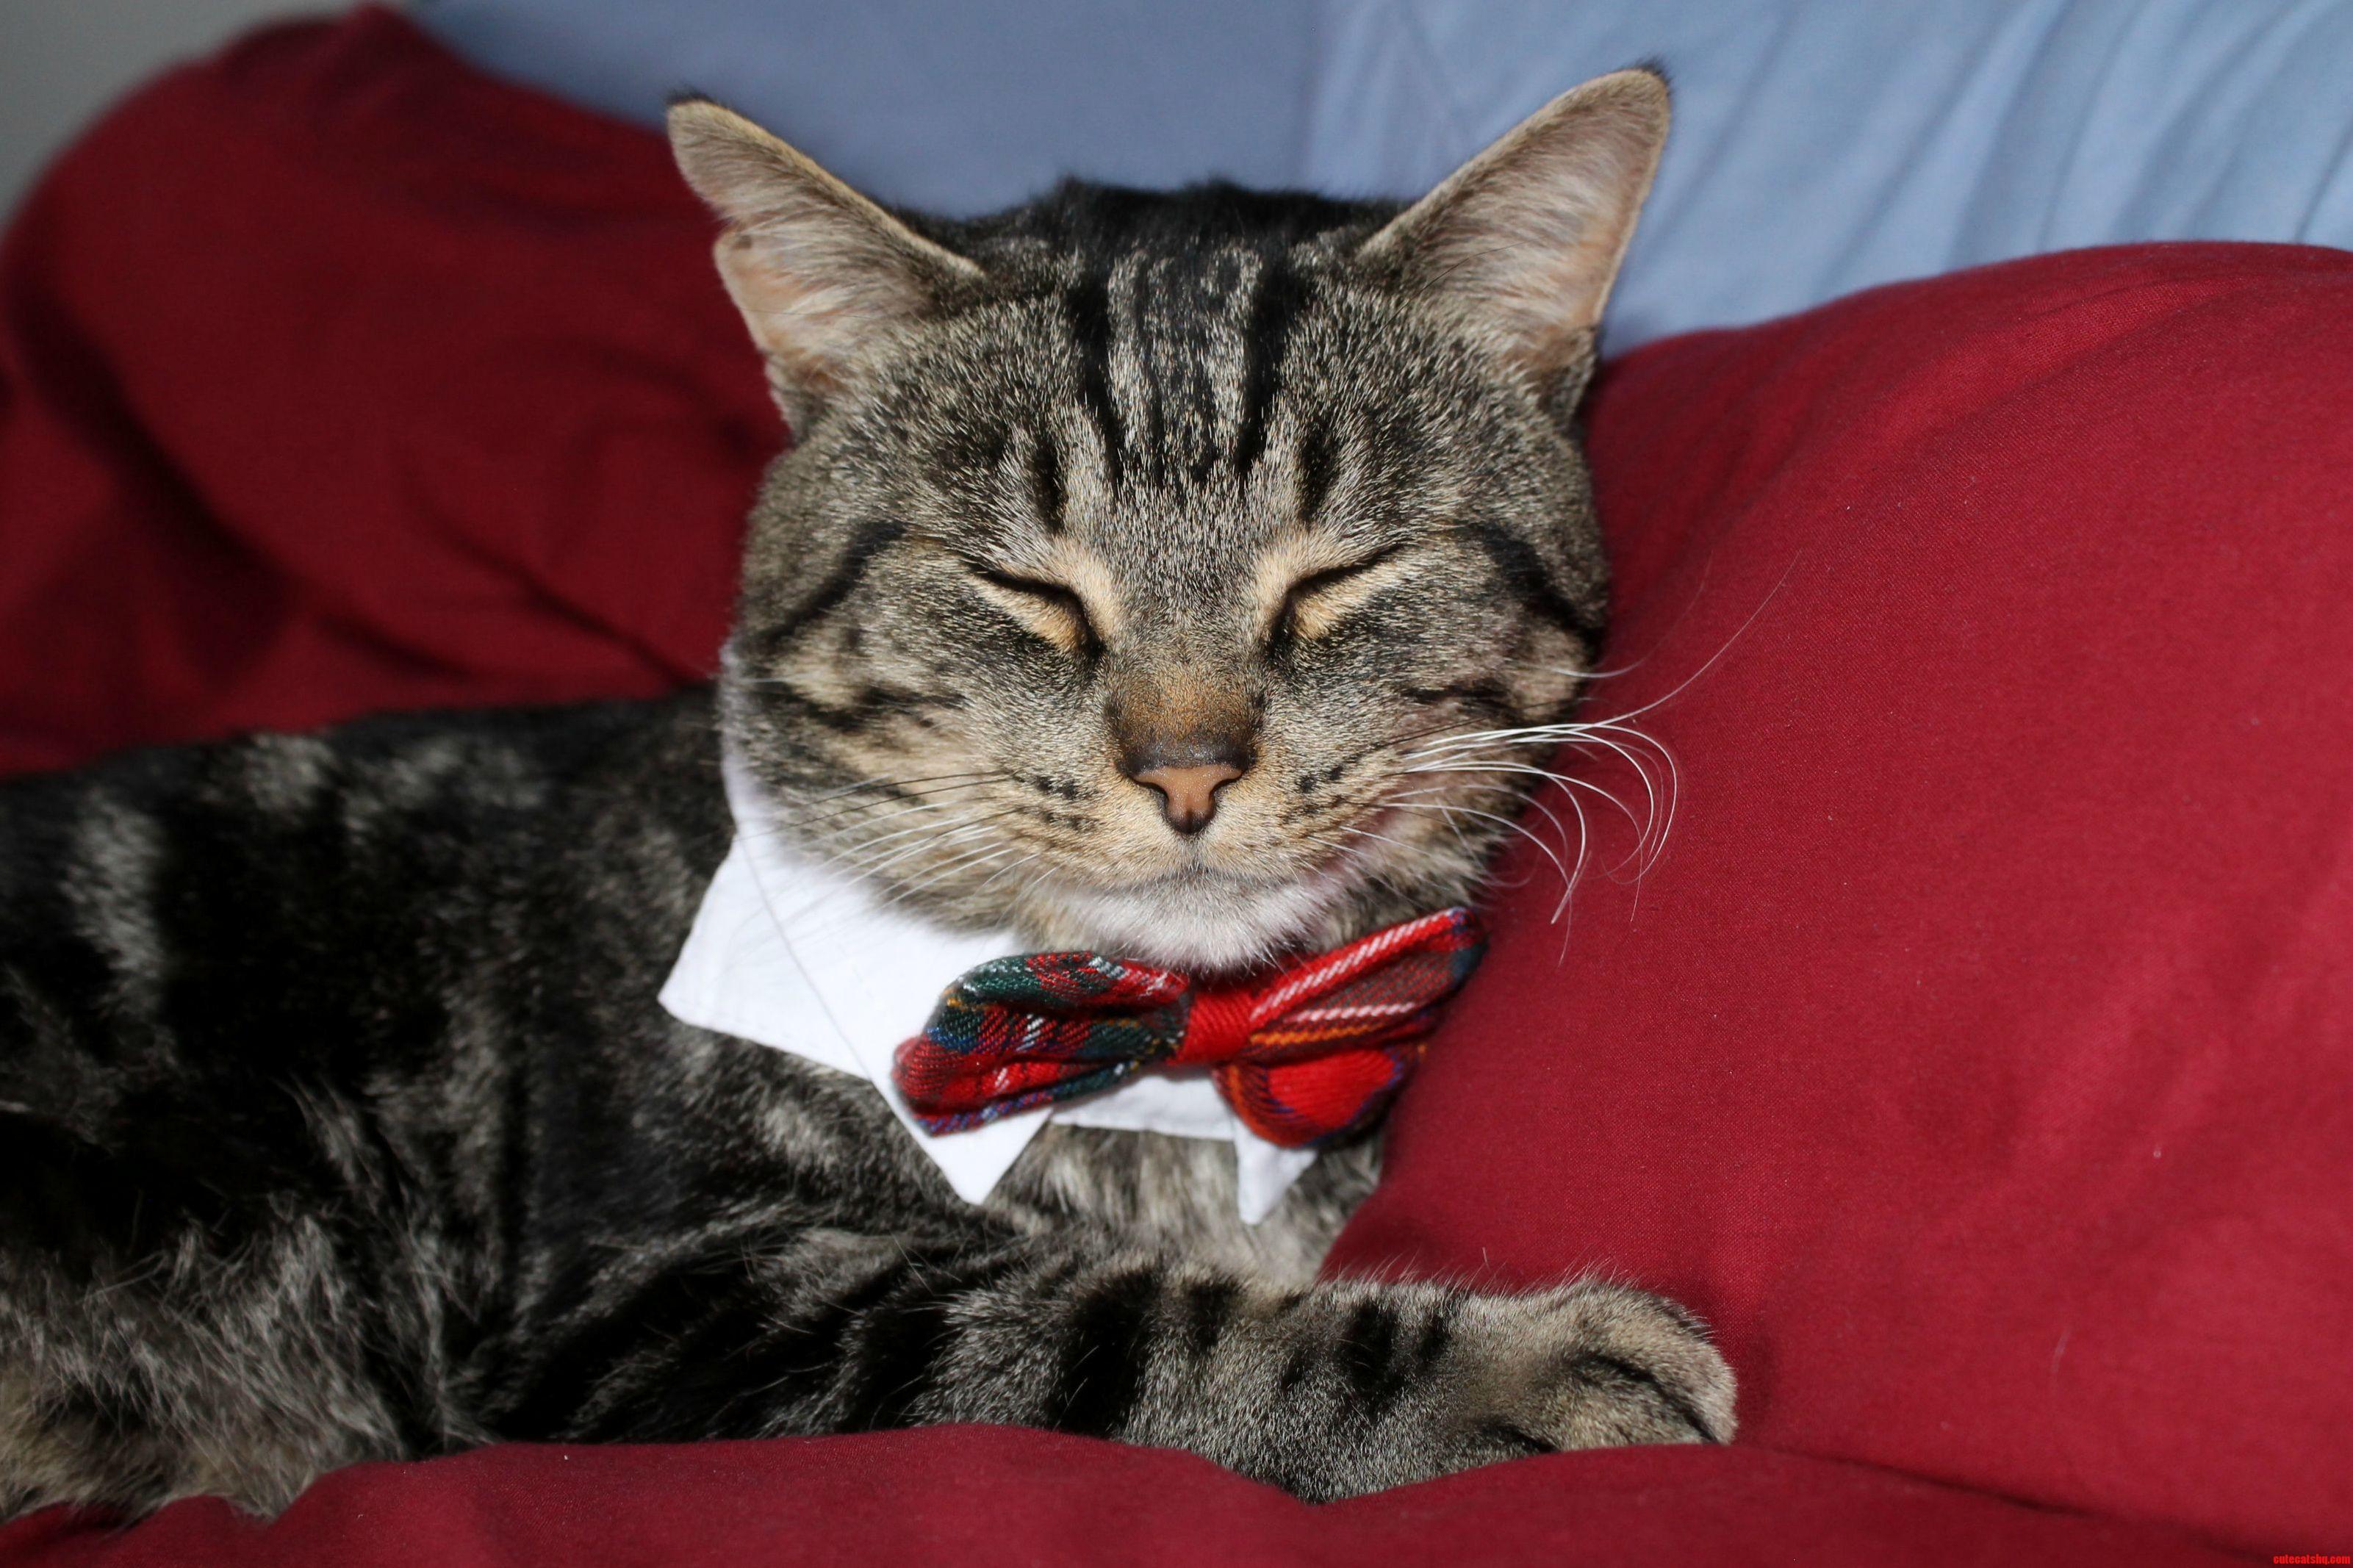 Murphy likes his bow ties